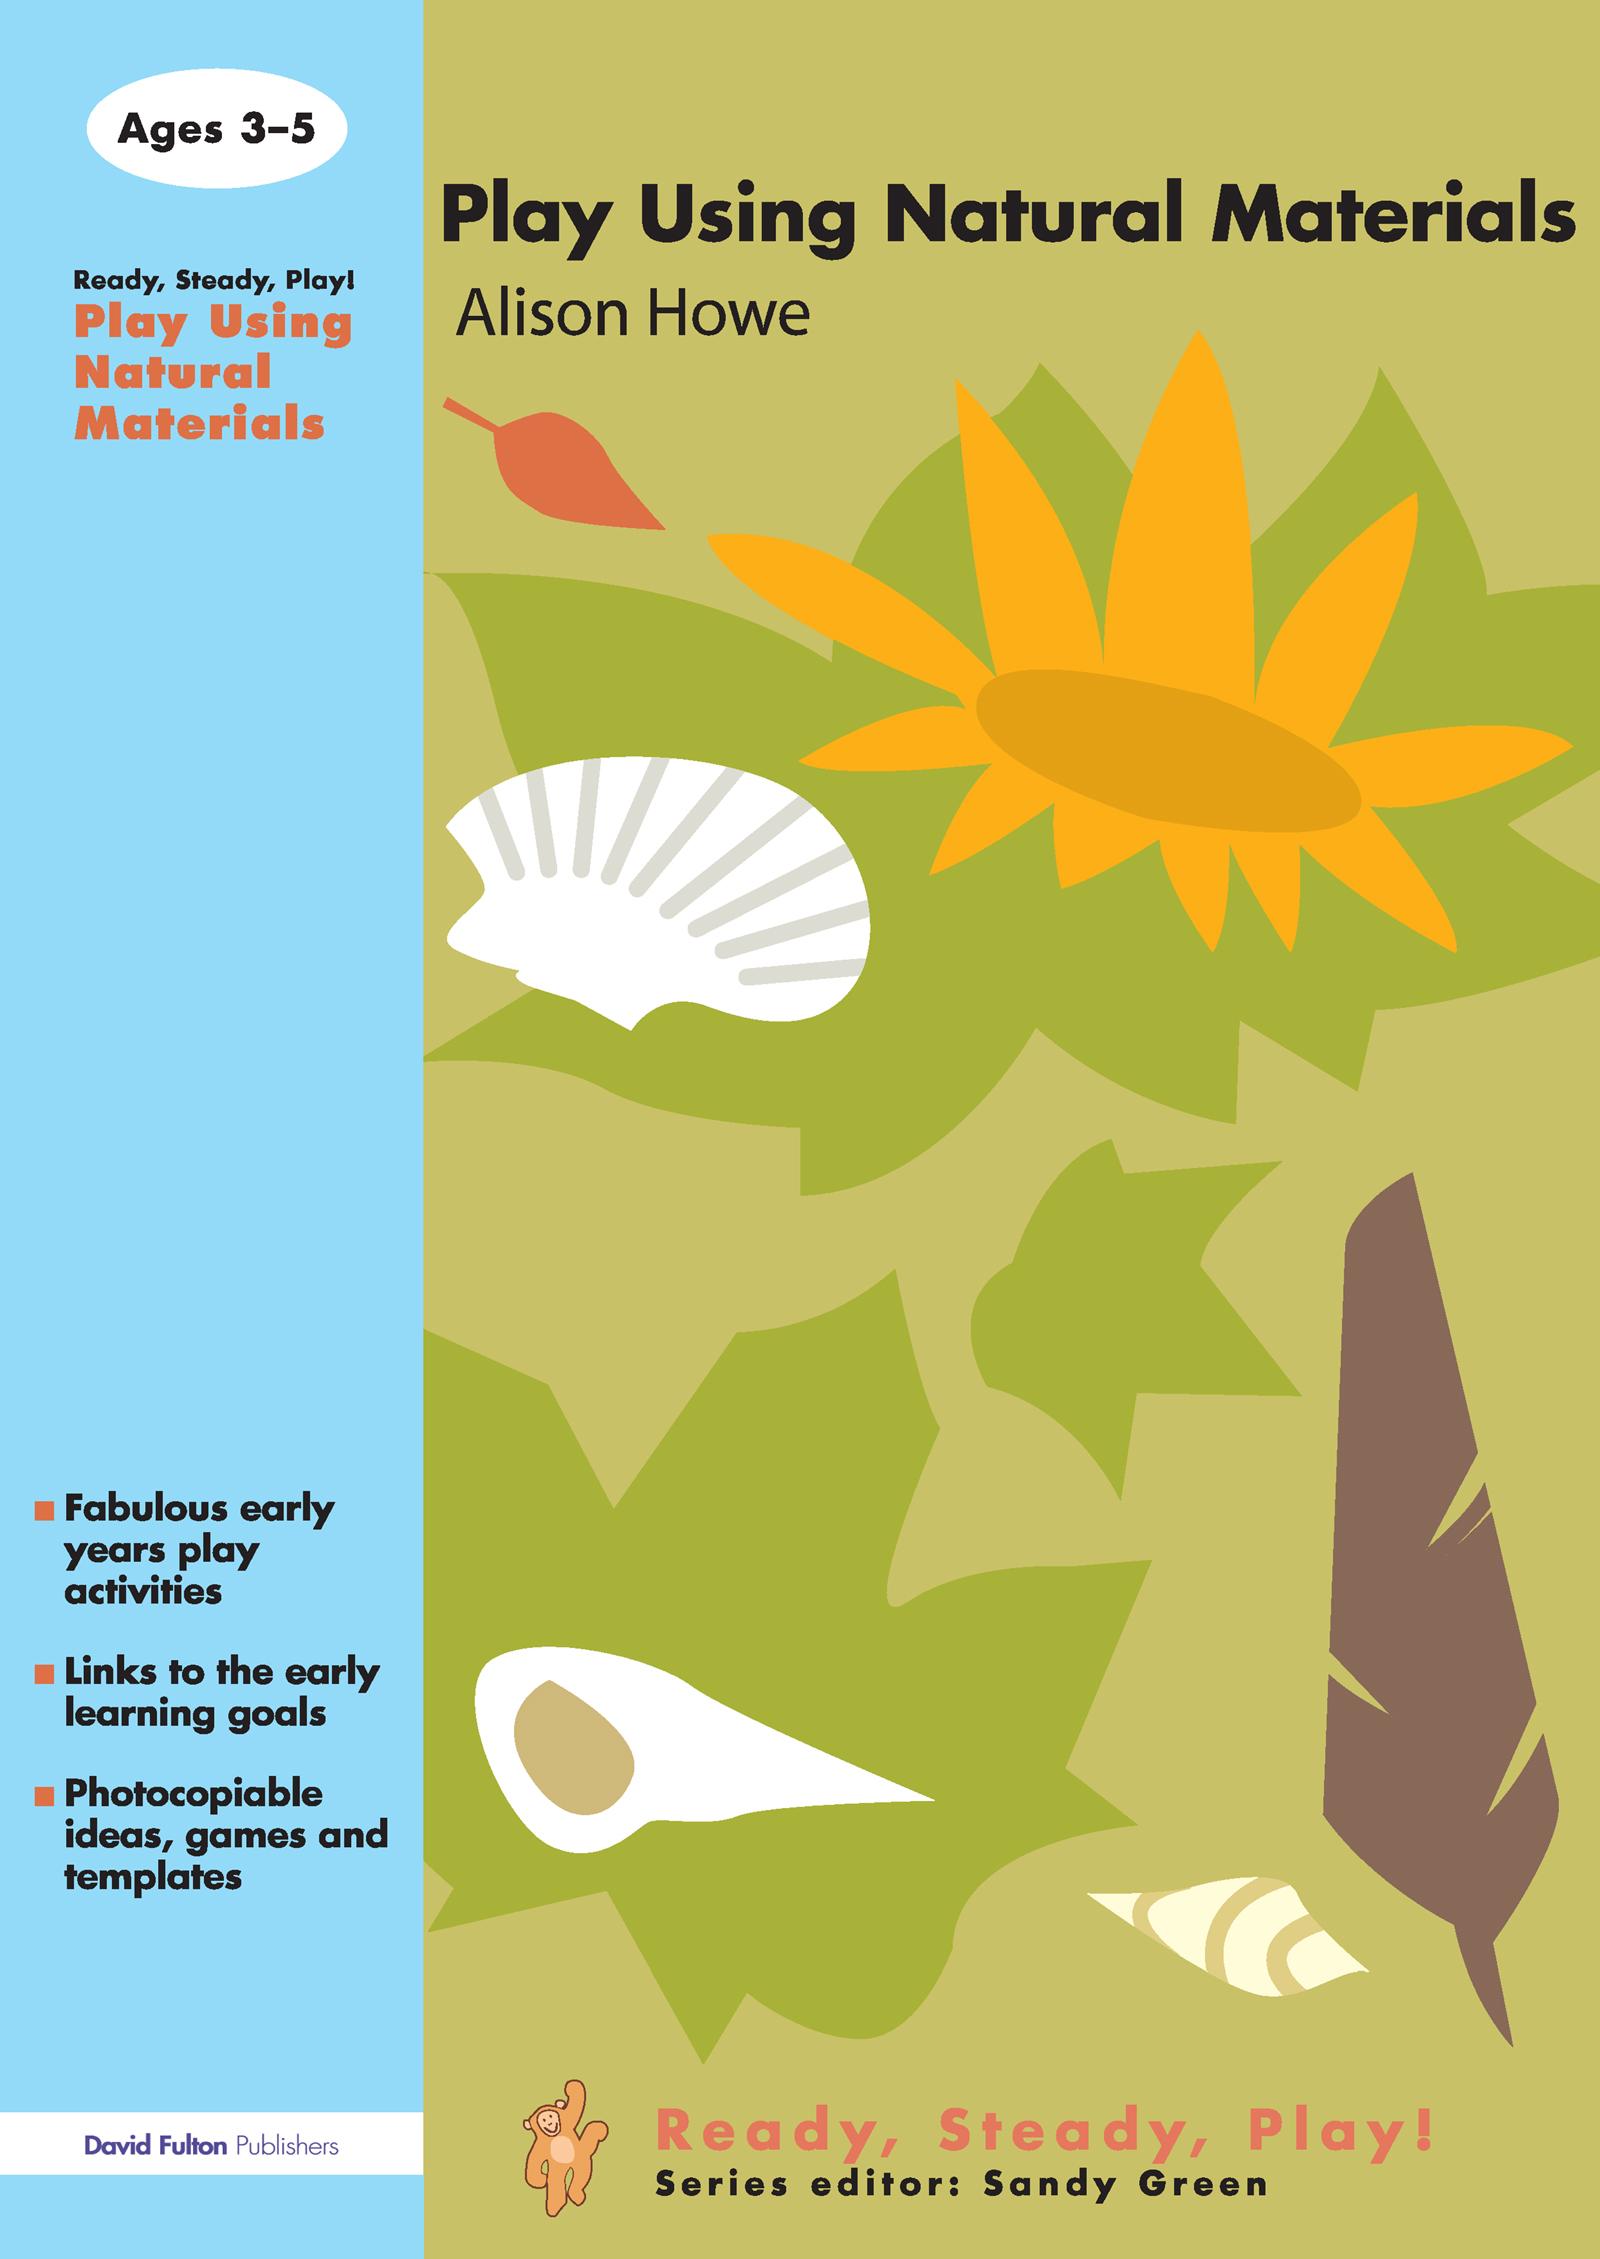 Play using Natural Materials book cover